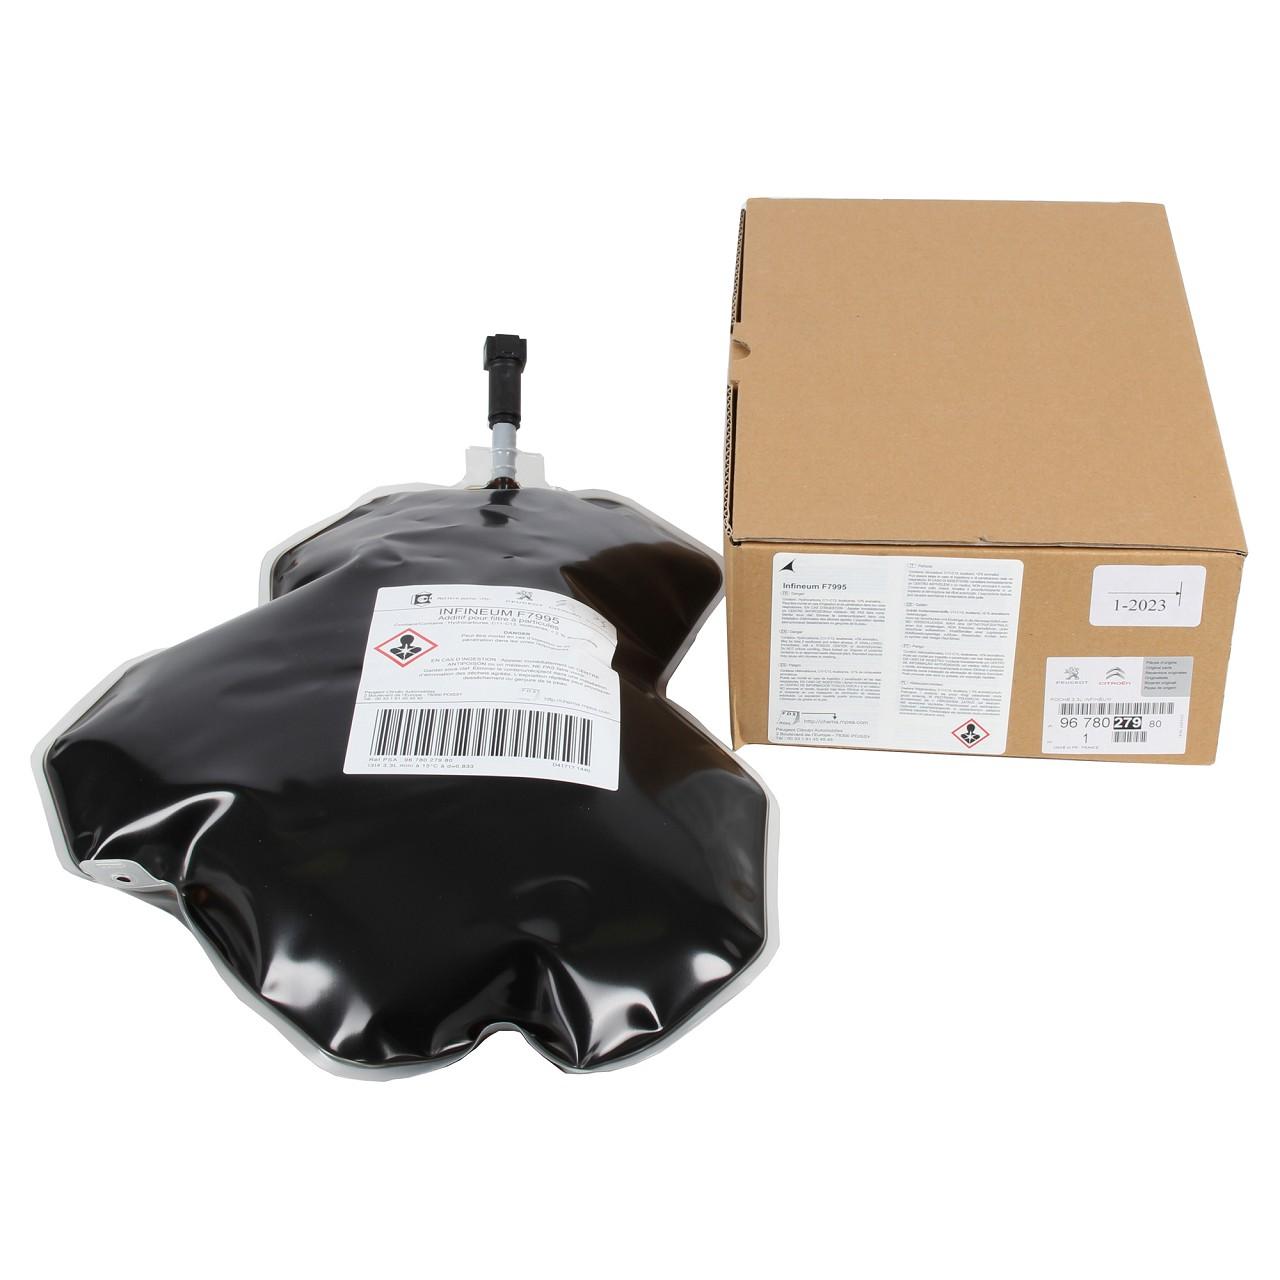 ORIGINAL PSA Kraftstoffadditiv F7995 für C-CROSSER 4007 2.2HDi 9678027980